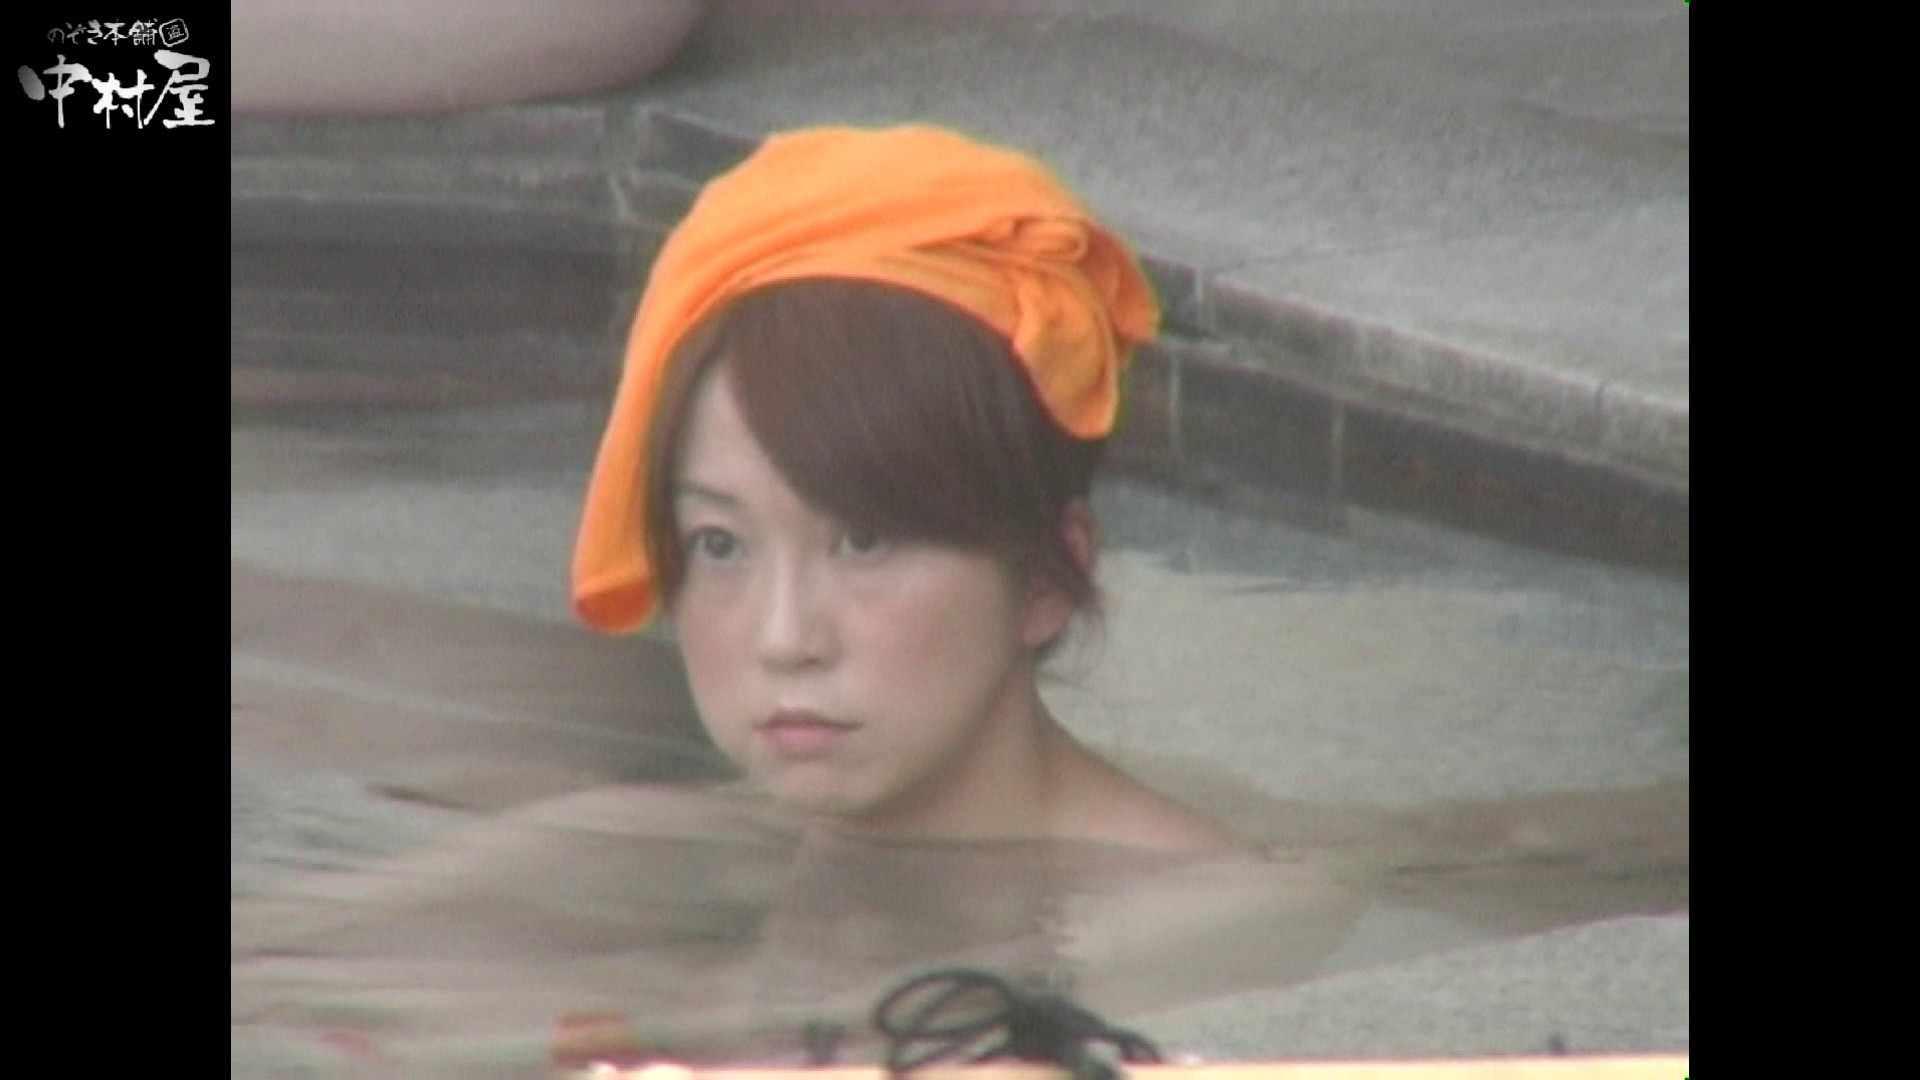 Aquaな露天風呂Vol.941 盗撮師作品  76pic 33